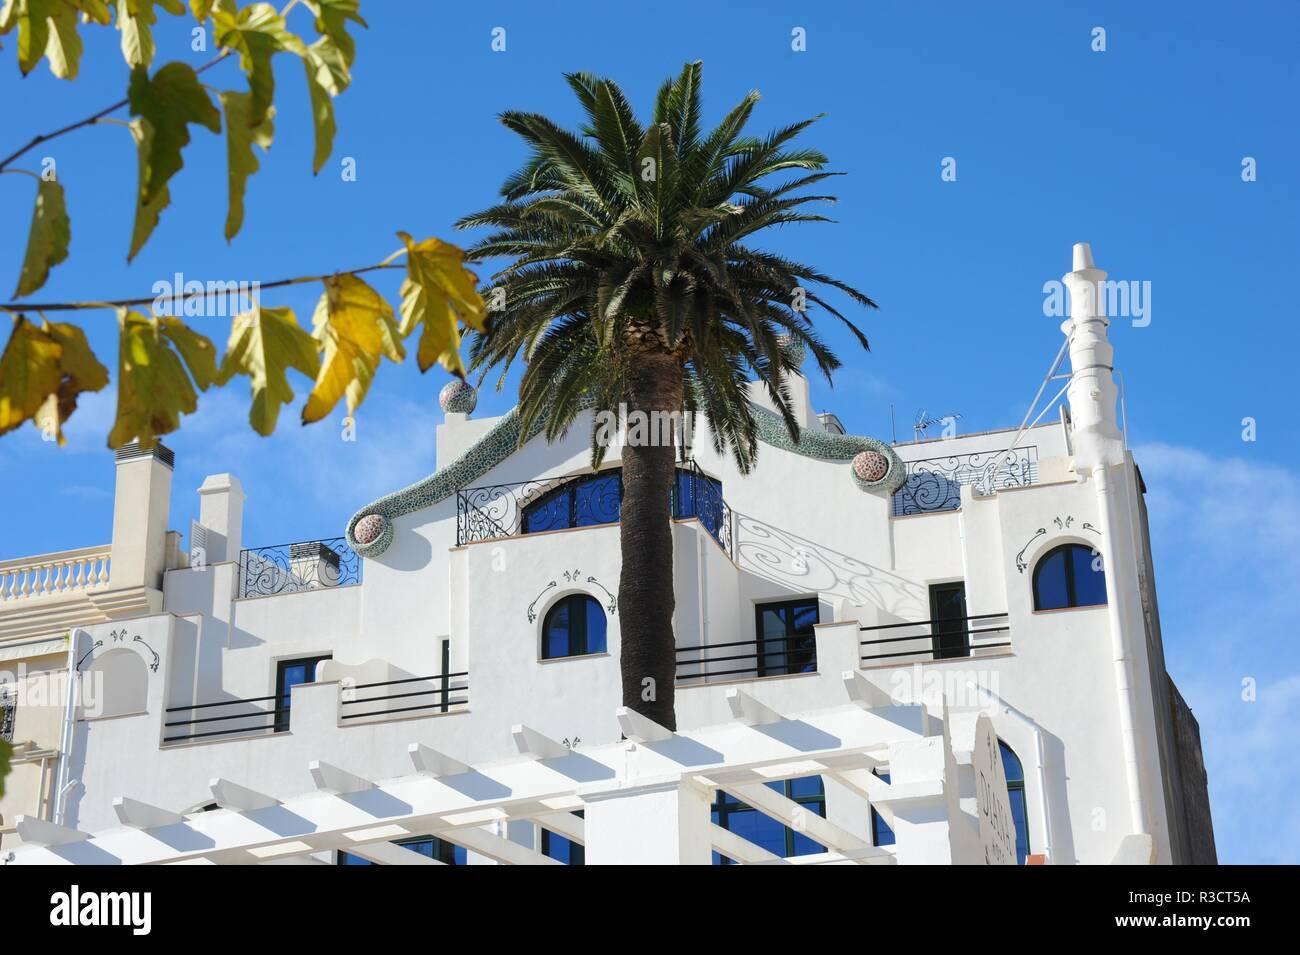 house facades in tossa de mar - costa brava - spain - Stock Image